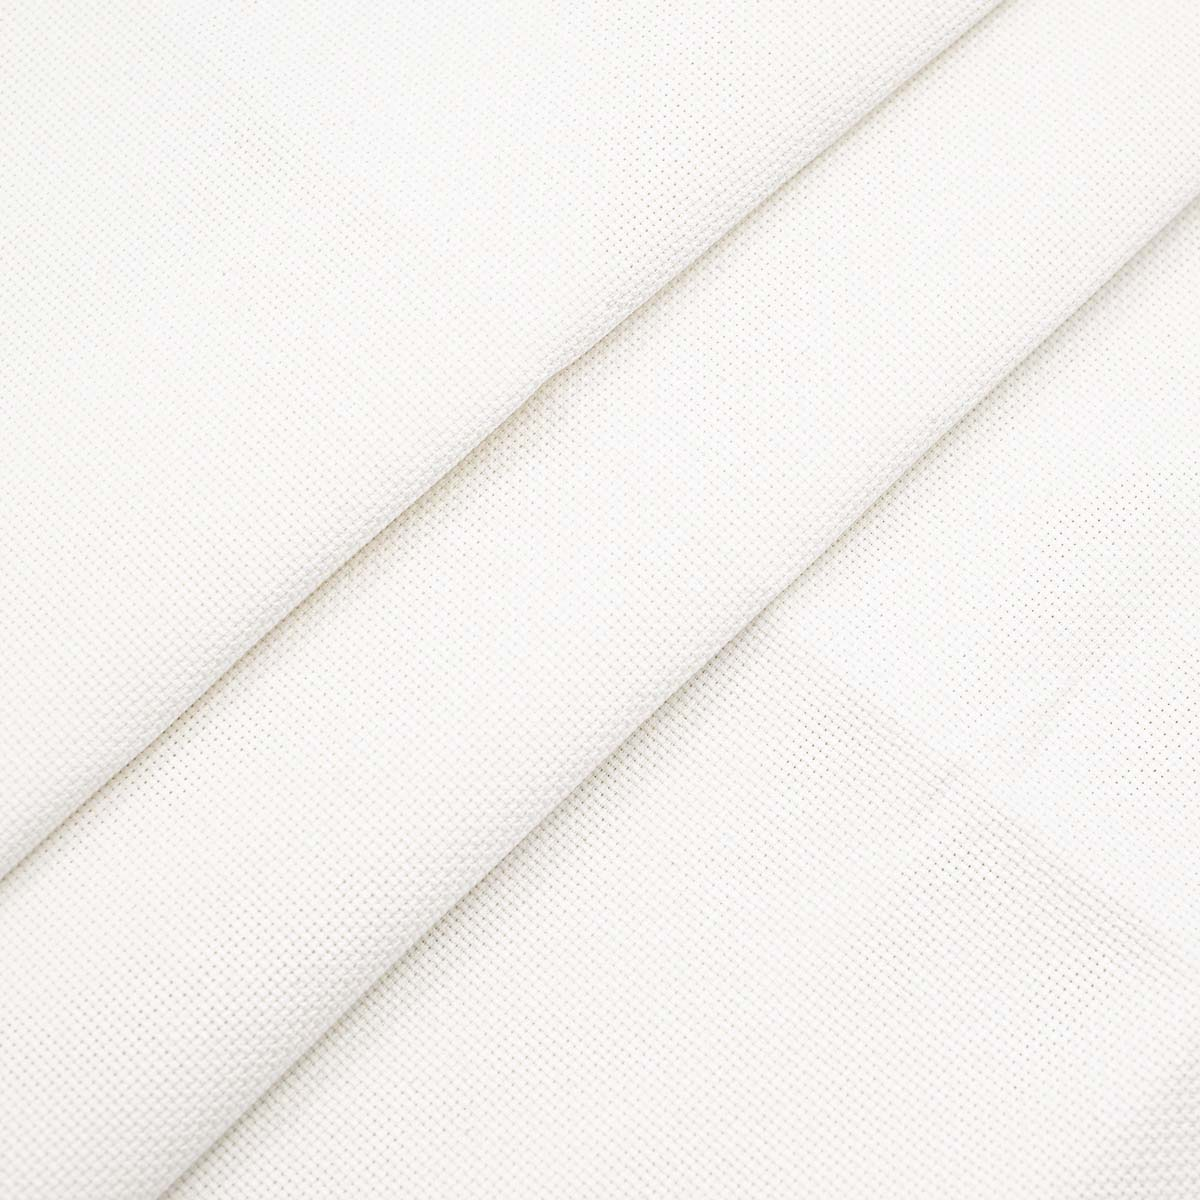 Канва Aida 16ct, 150*100см белая Bestex